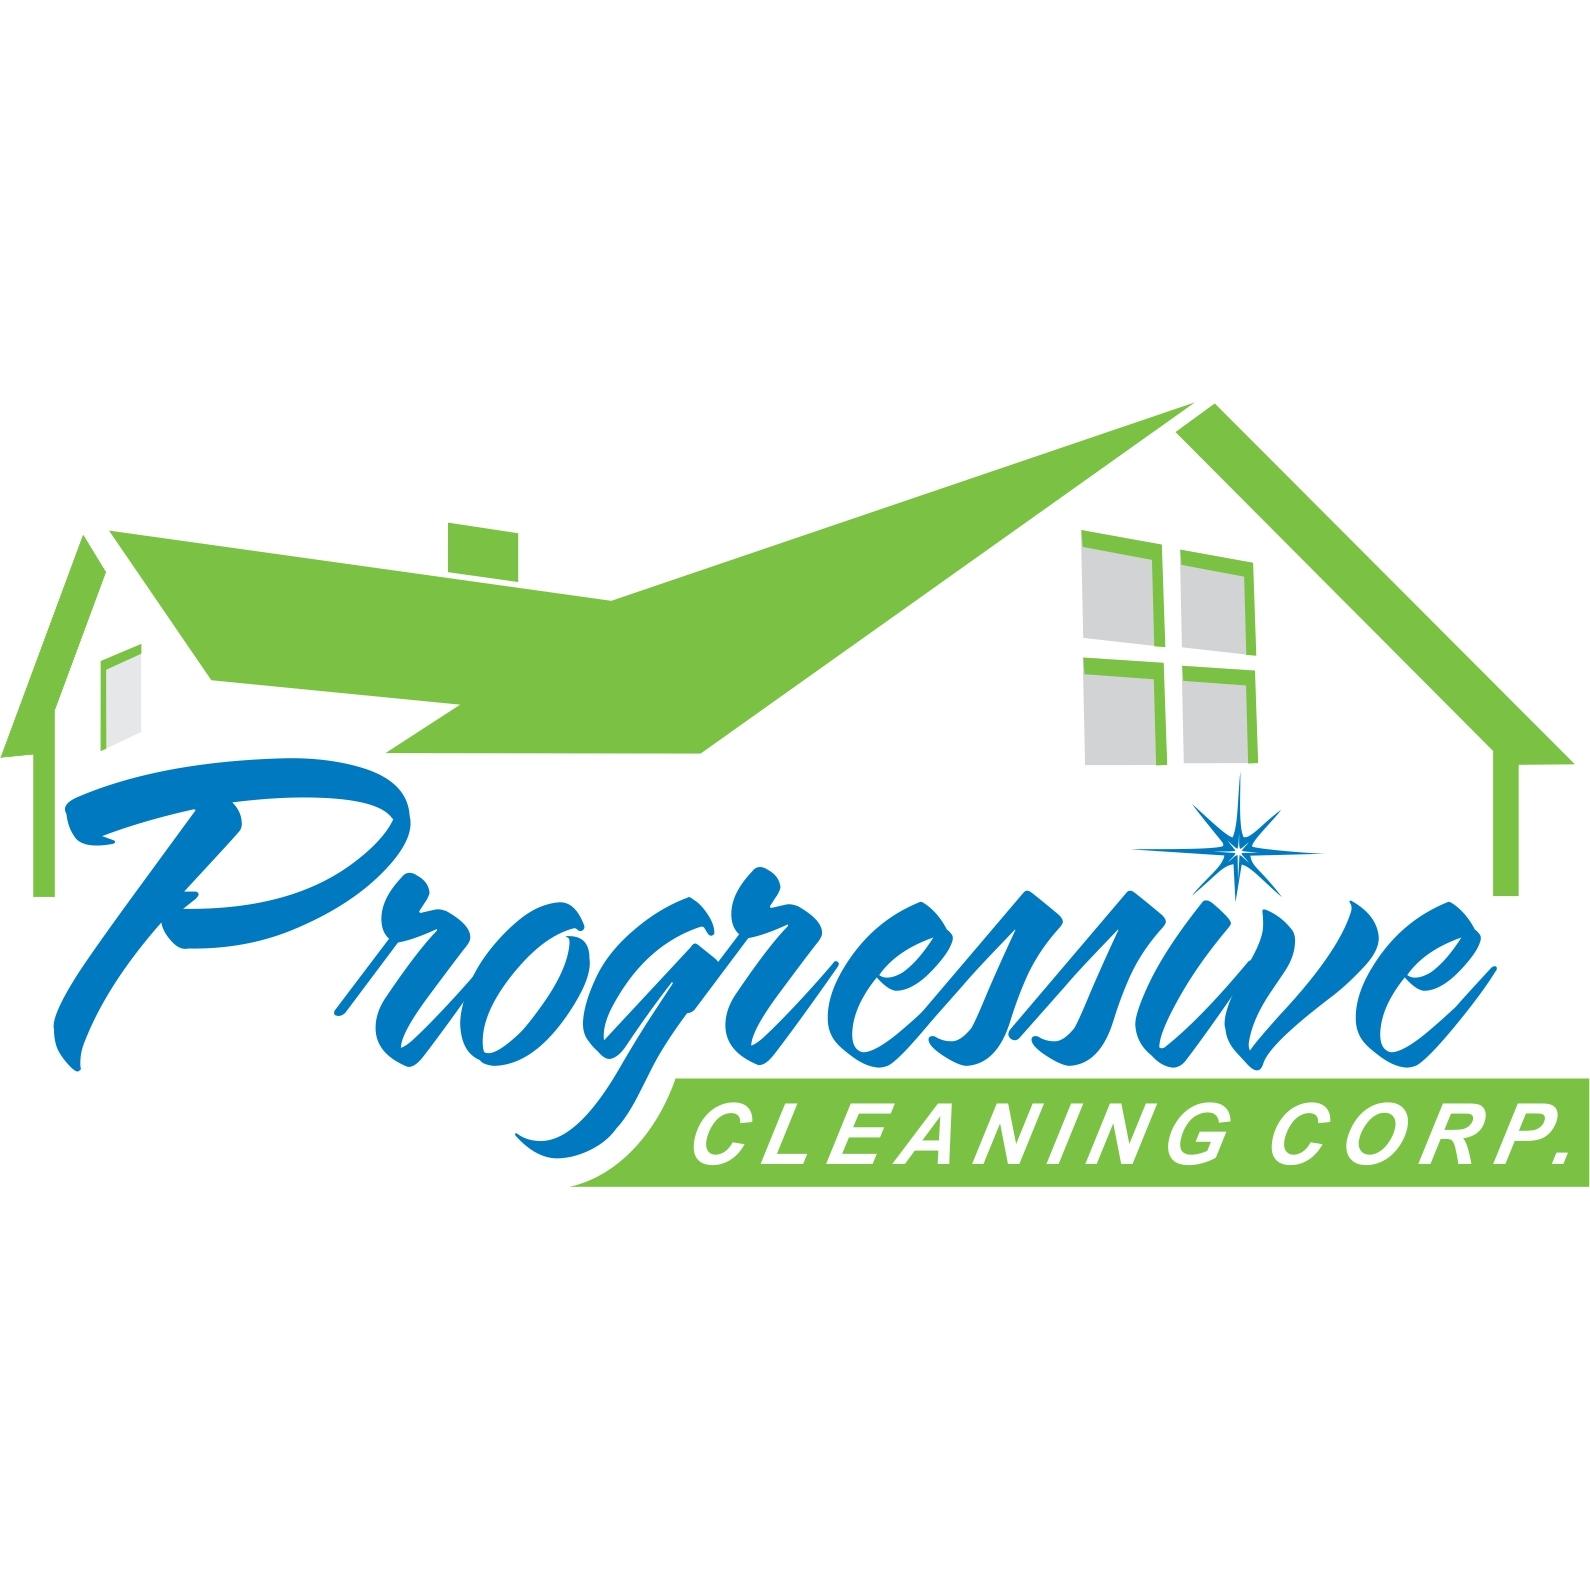 Progressive Cleaning Corp.